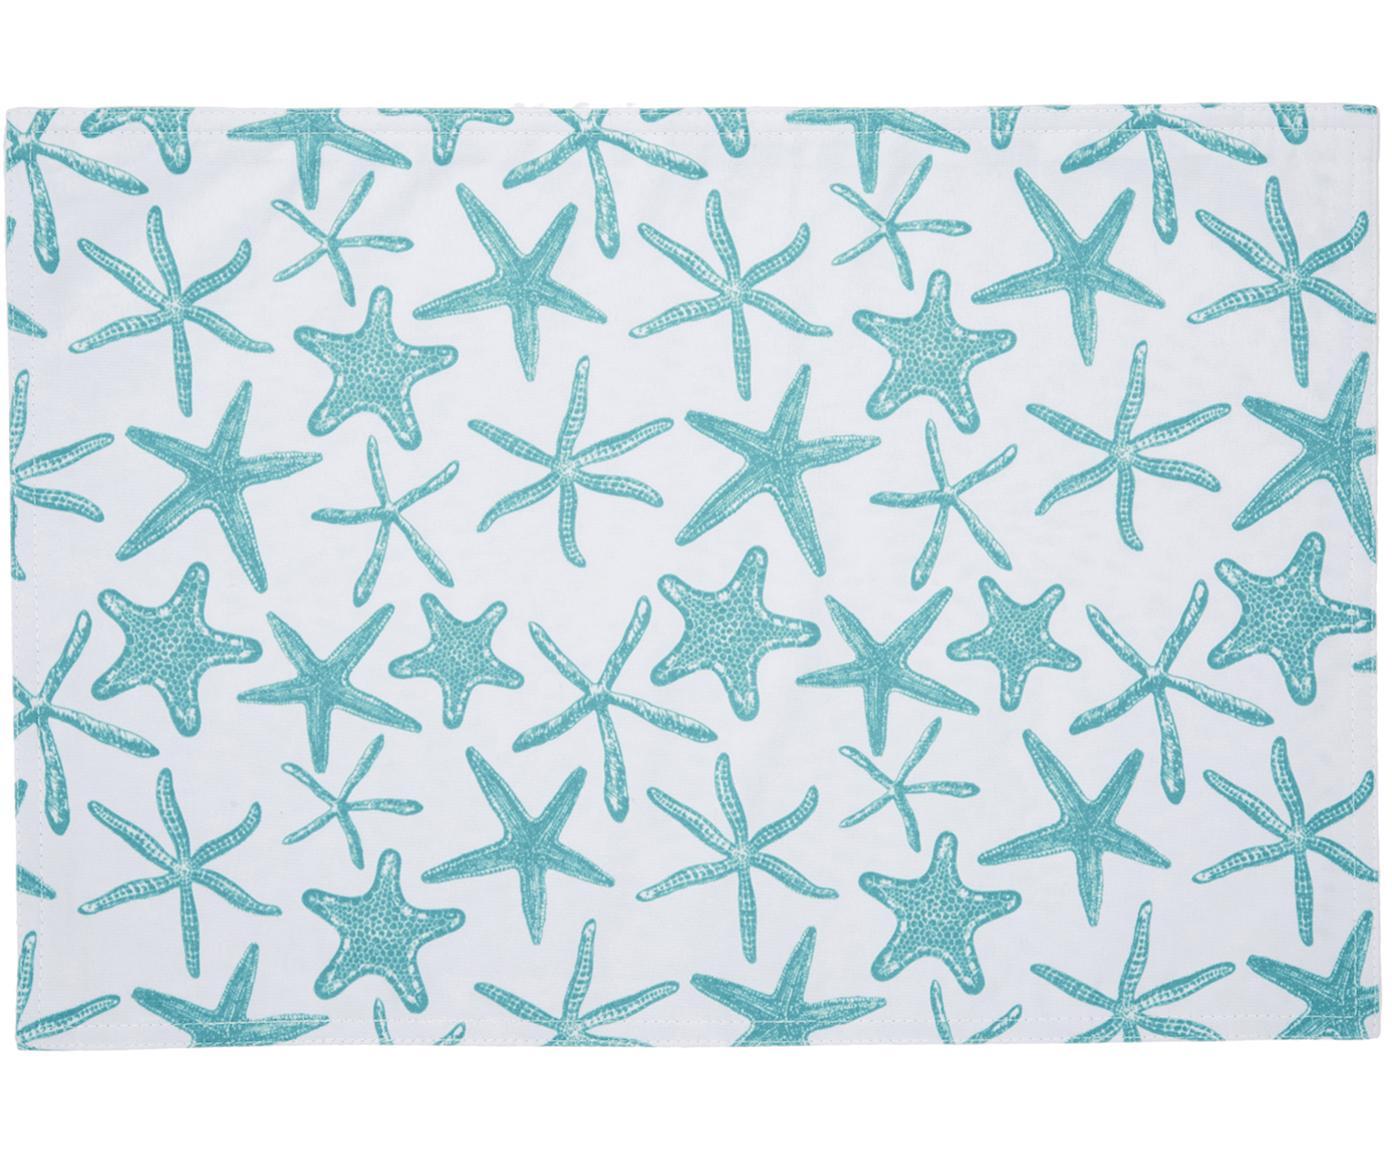 Manteles individuales impermeables Starbone, 2uds., Poliéster, Blanco, azul, An 33x L 48 cm